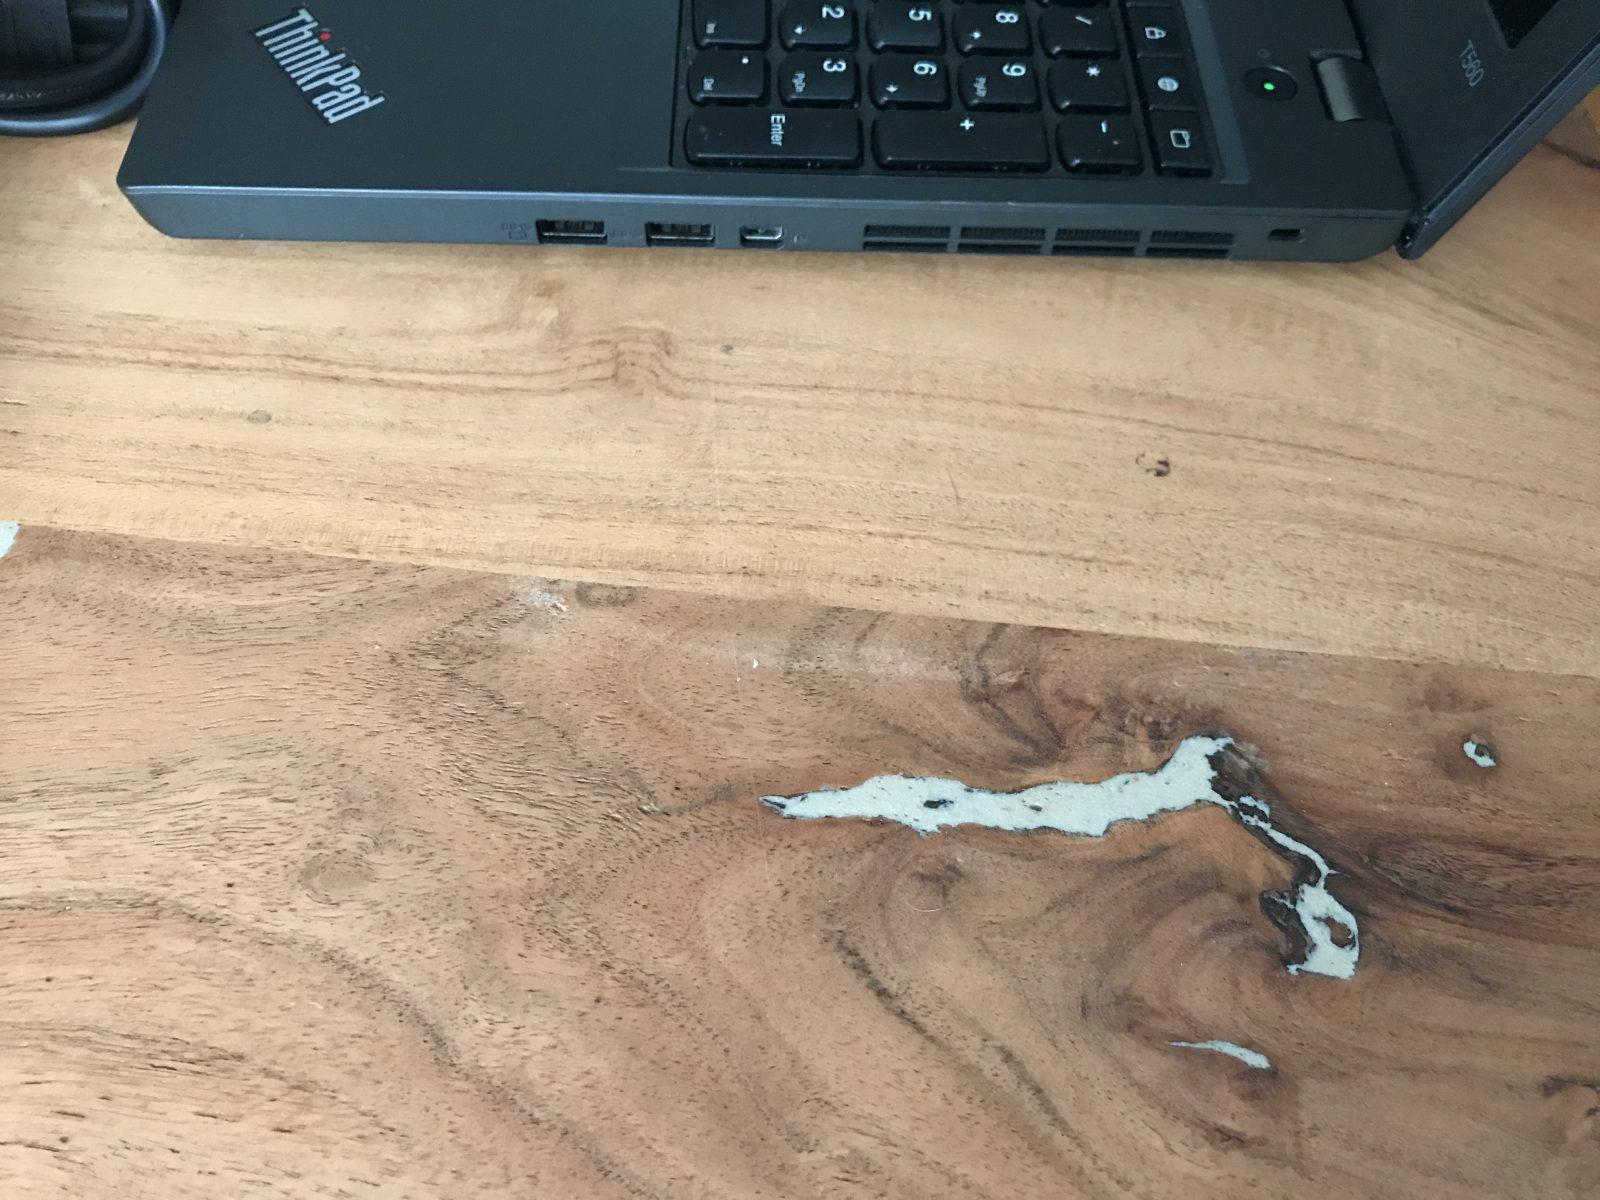 Lenovo Thinkpad T560 i5-6300 8GB 256GB SSD 15.6 inch Full HD